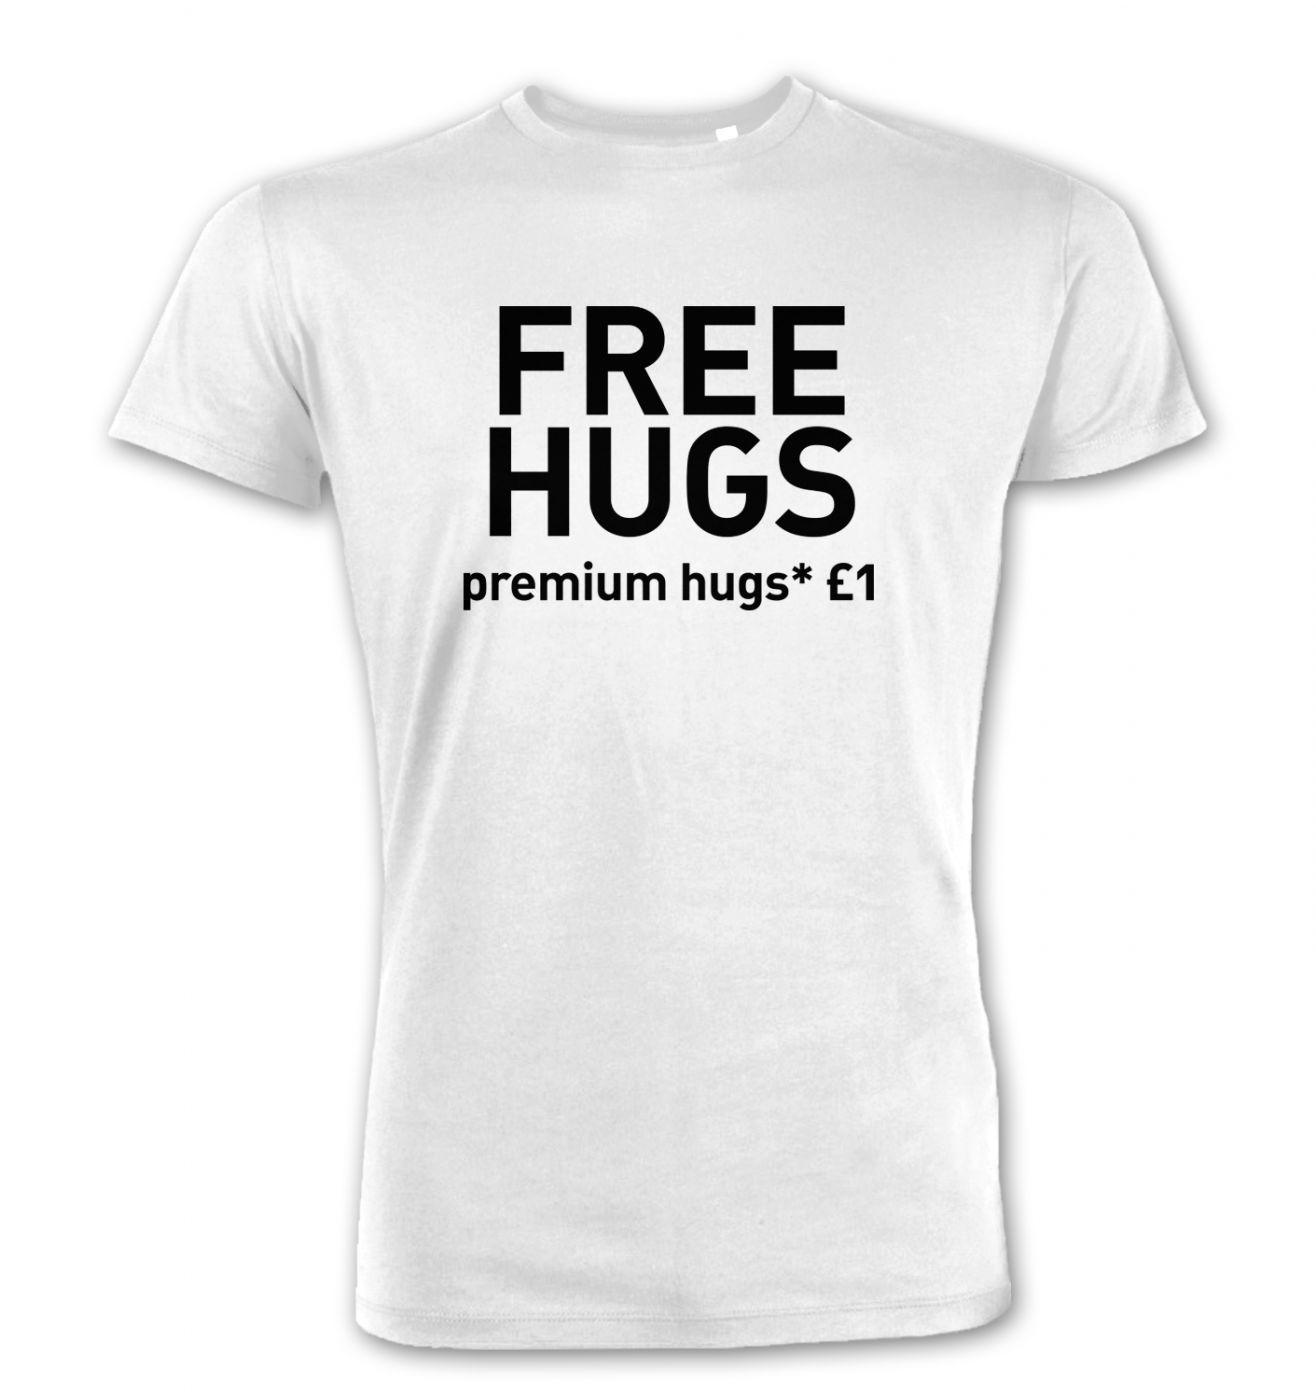 Free Hugs (Premium Hugs £1) premium t-shirt